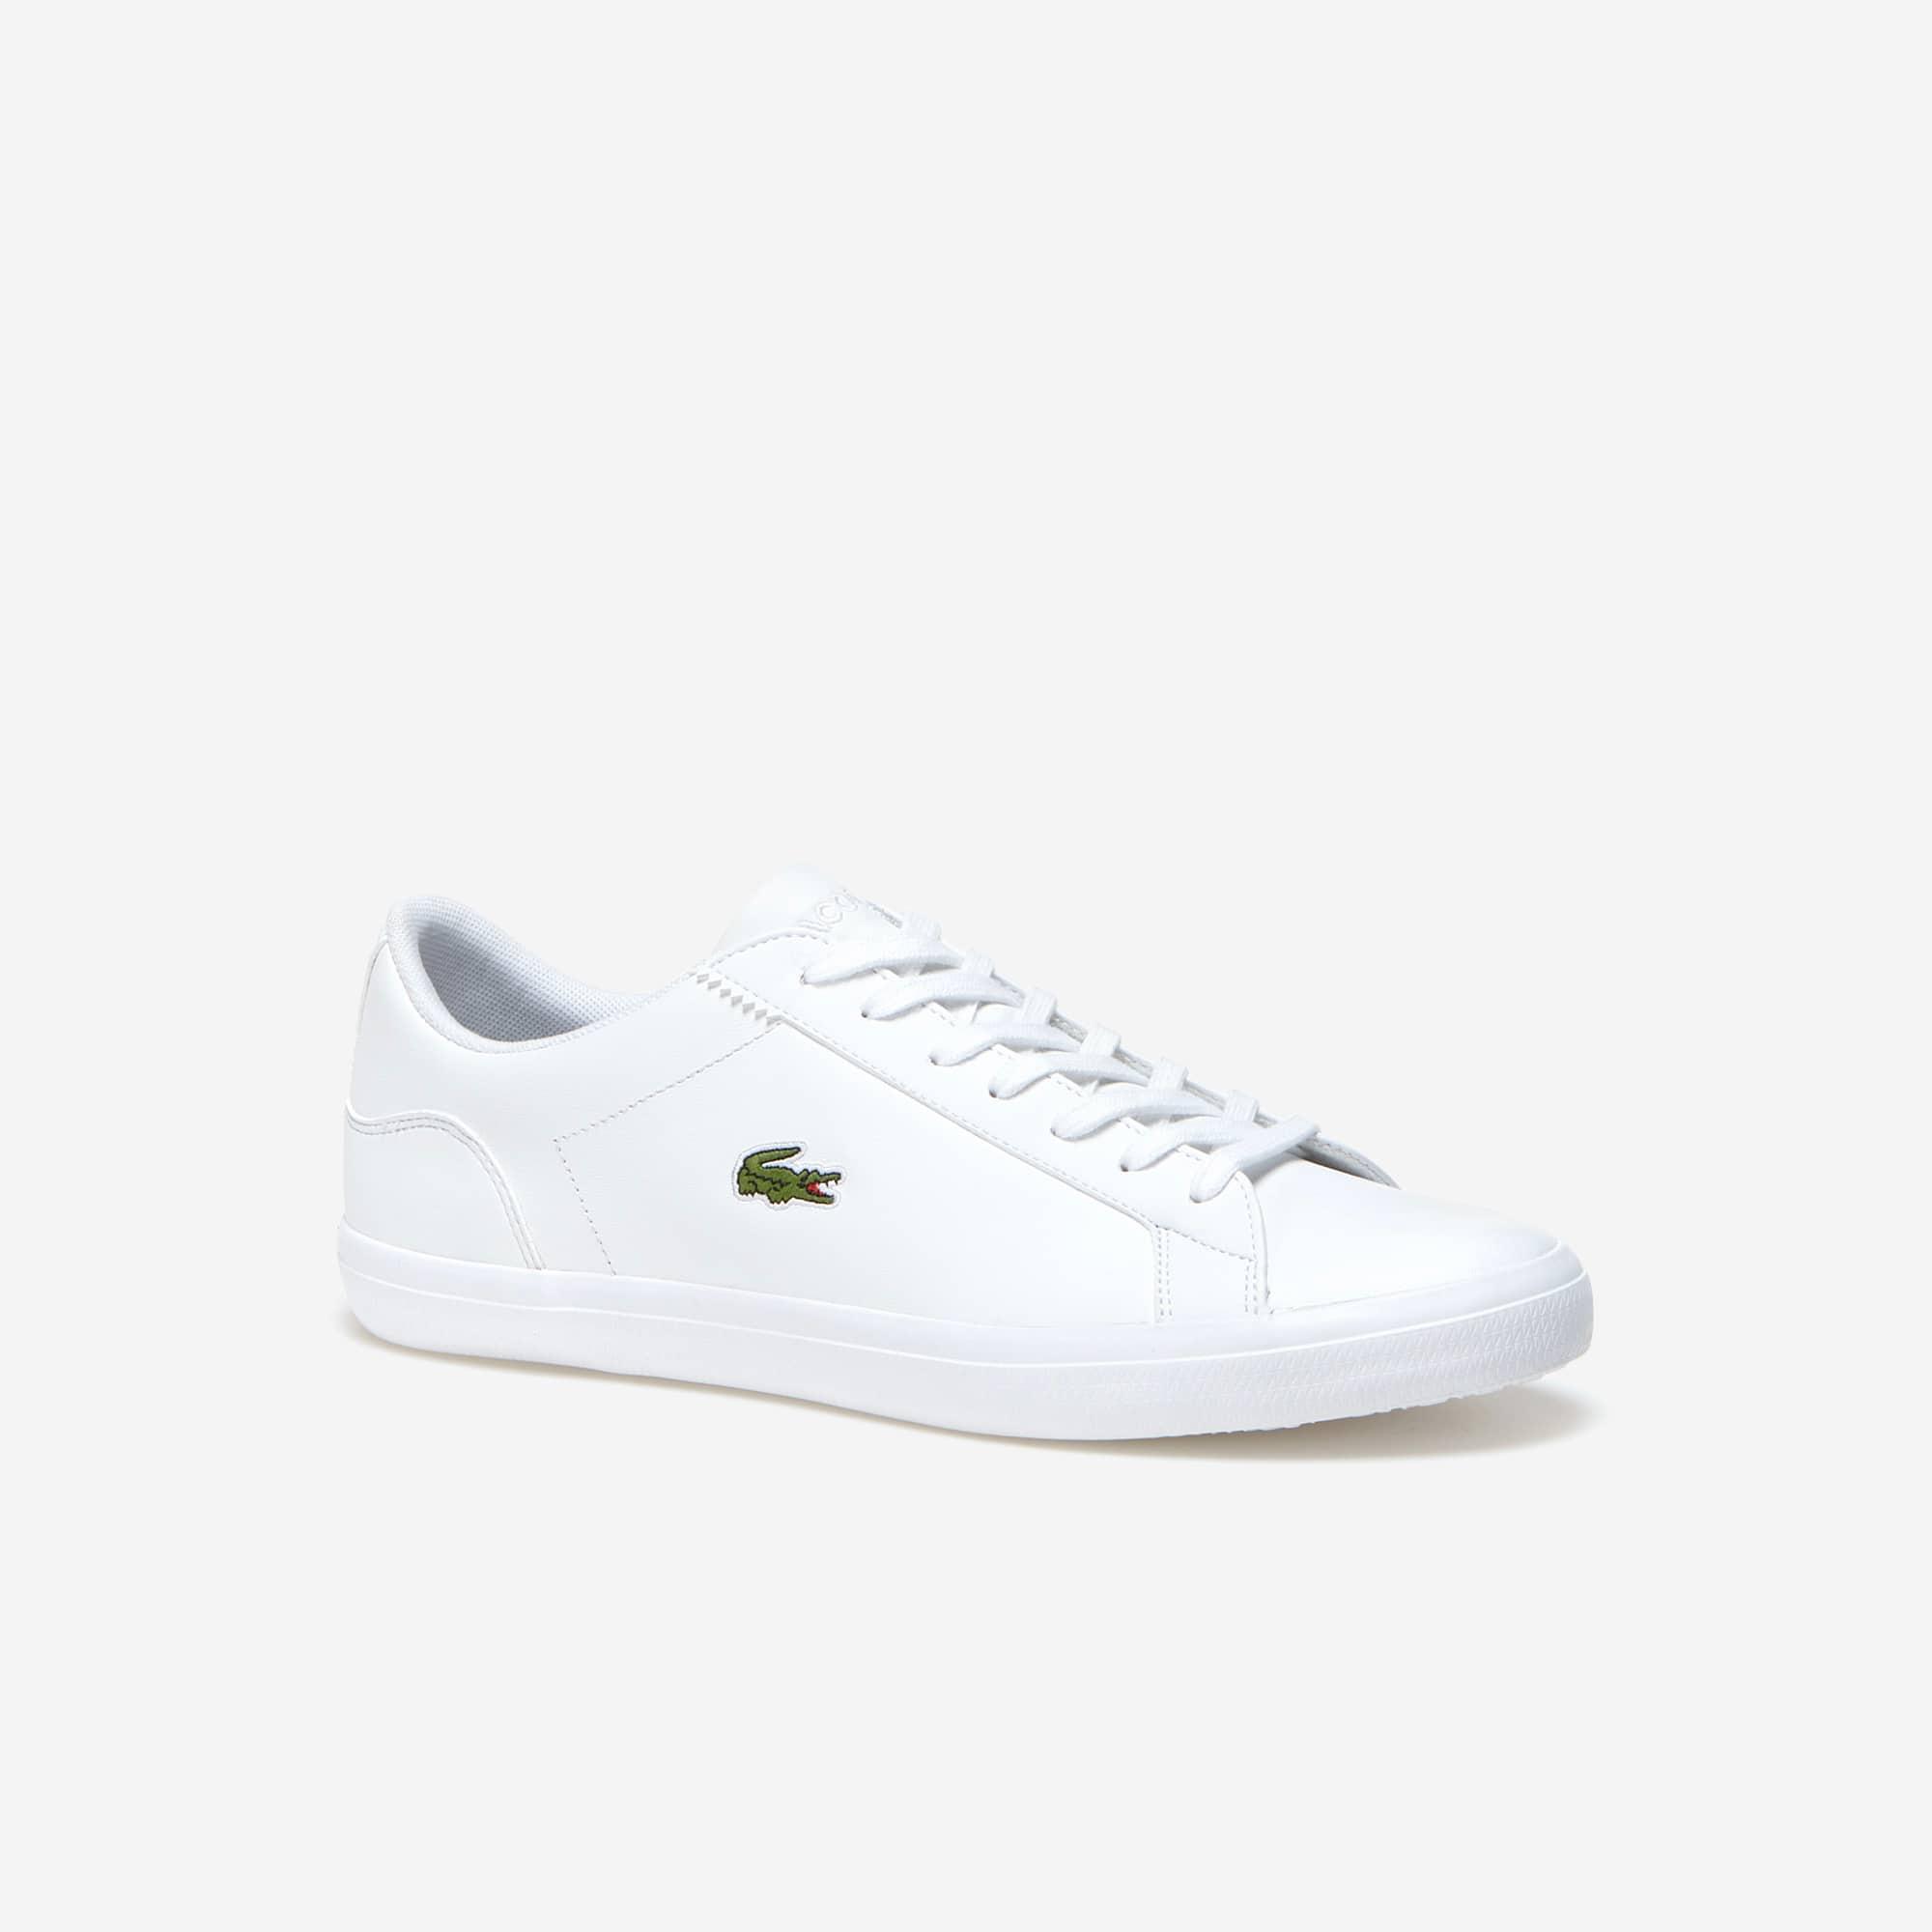 Lacoste - Herren-Sneakers LEROND aus einfarbigem Leder - 1